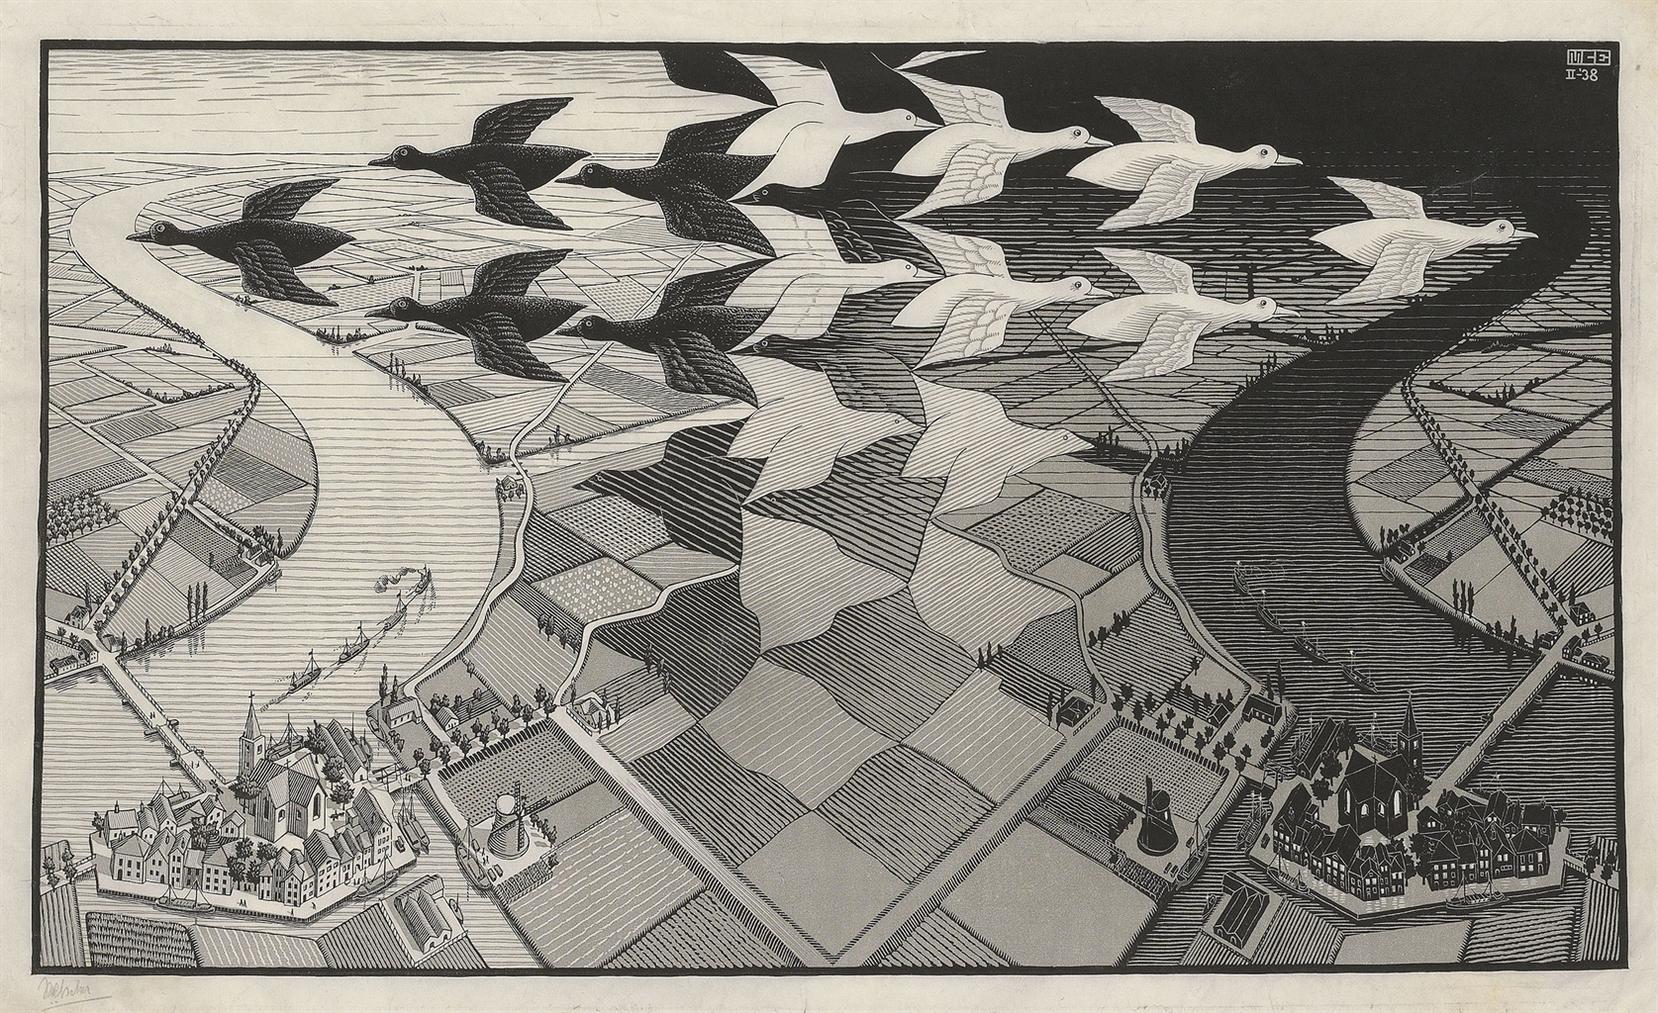 Maurits Cornelis Escher-Day And Night-1938